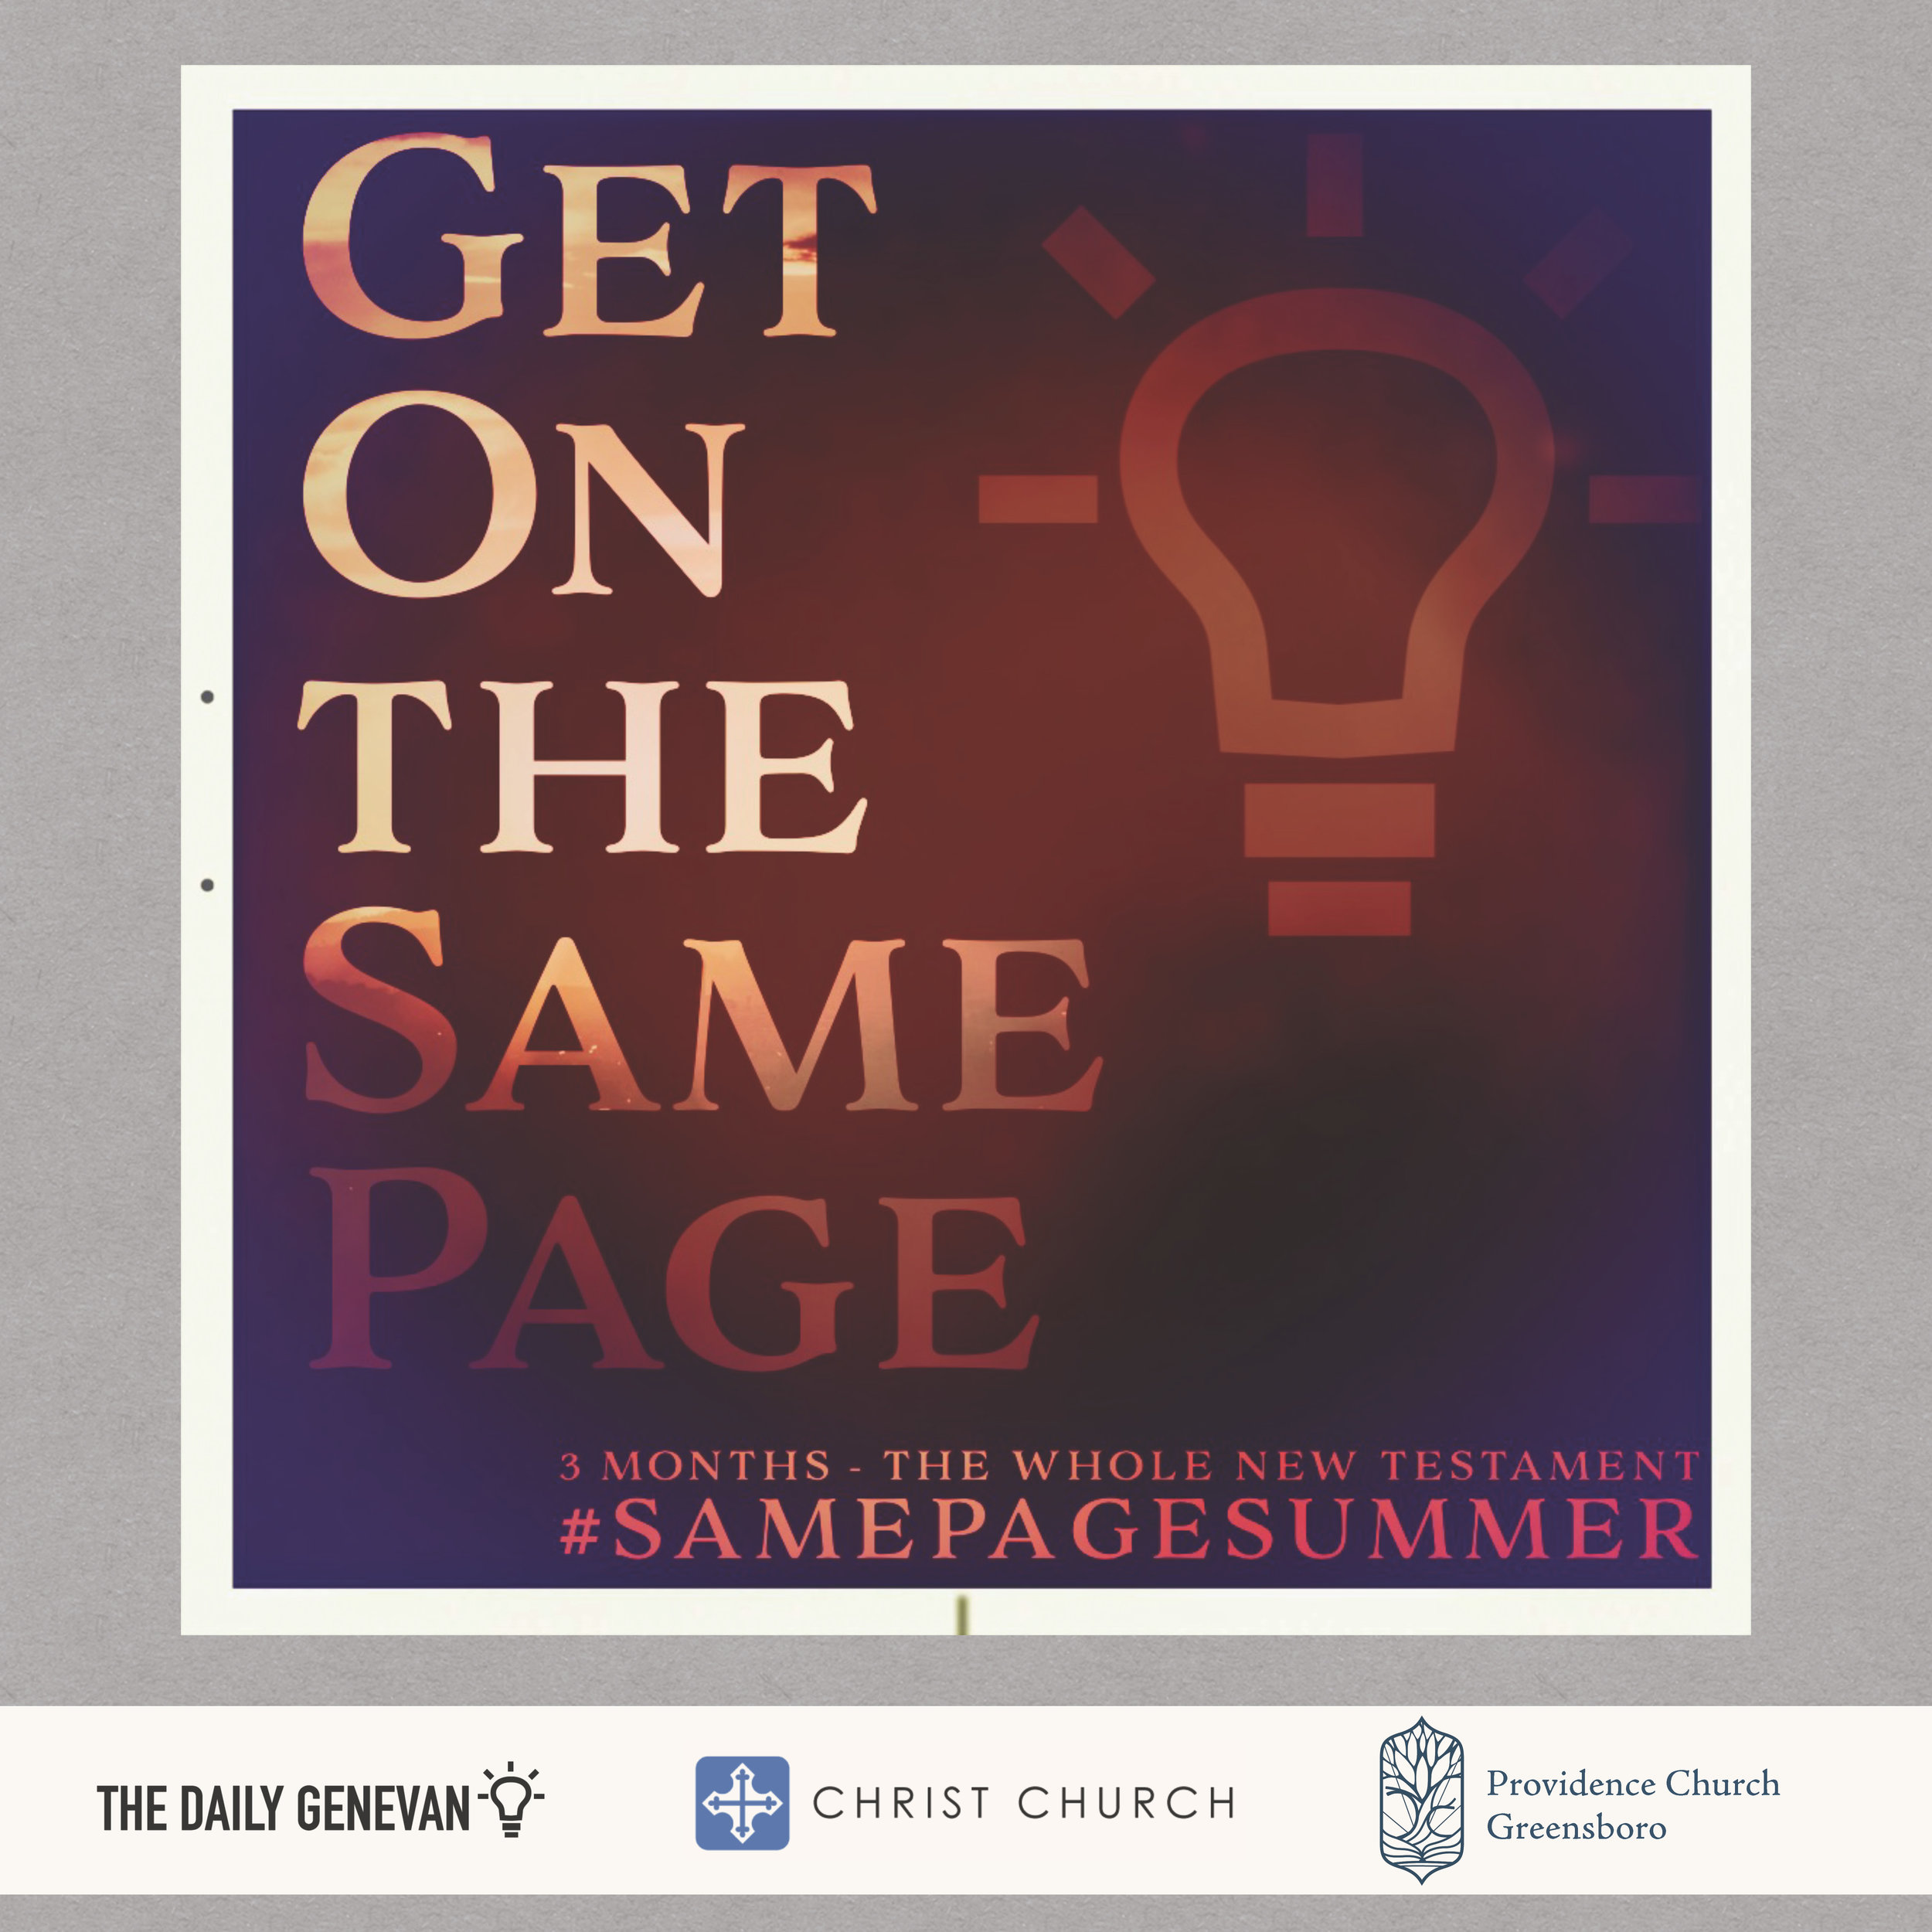 SamePageSummer2019cover_Page_1.jpg